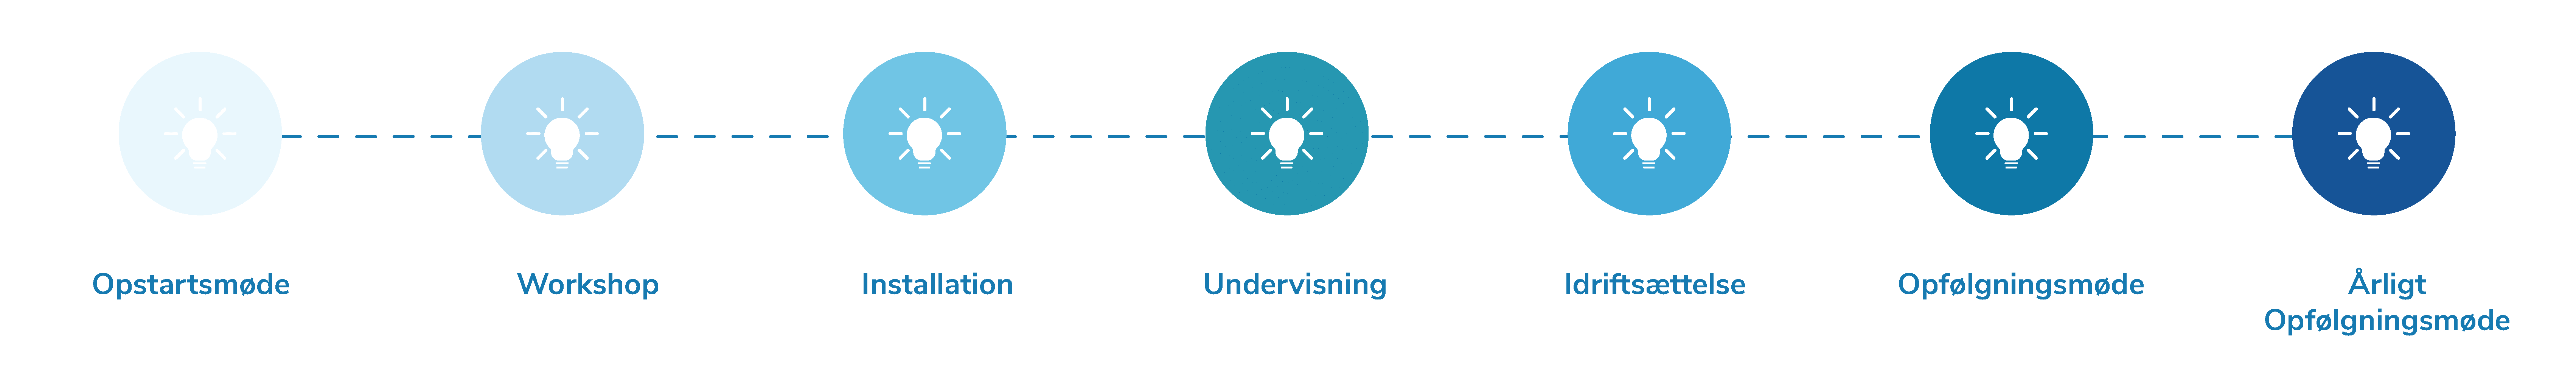 IntelligentCARE implementerings process